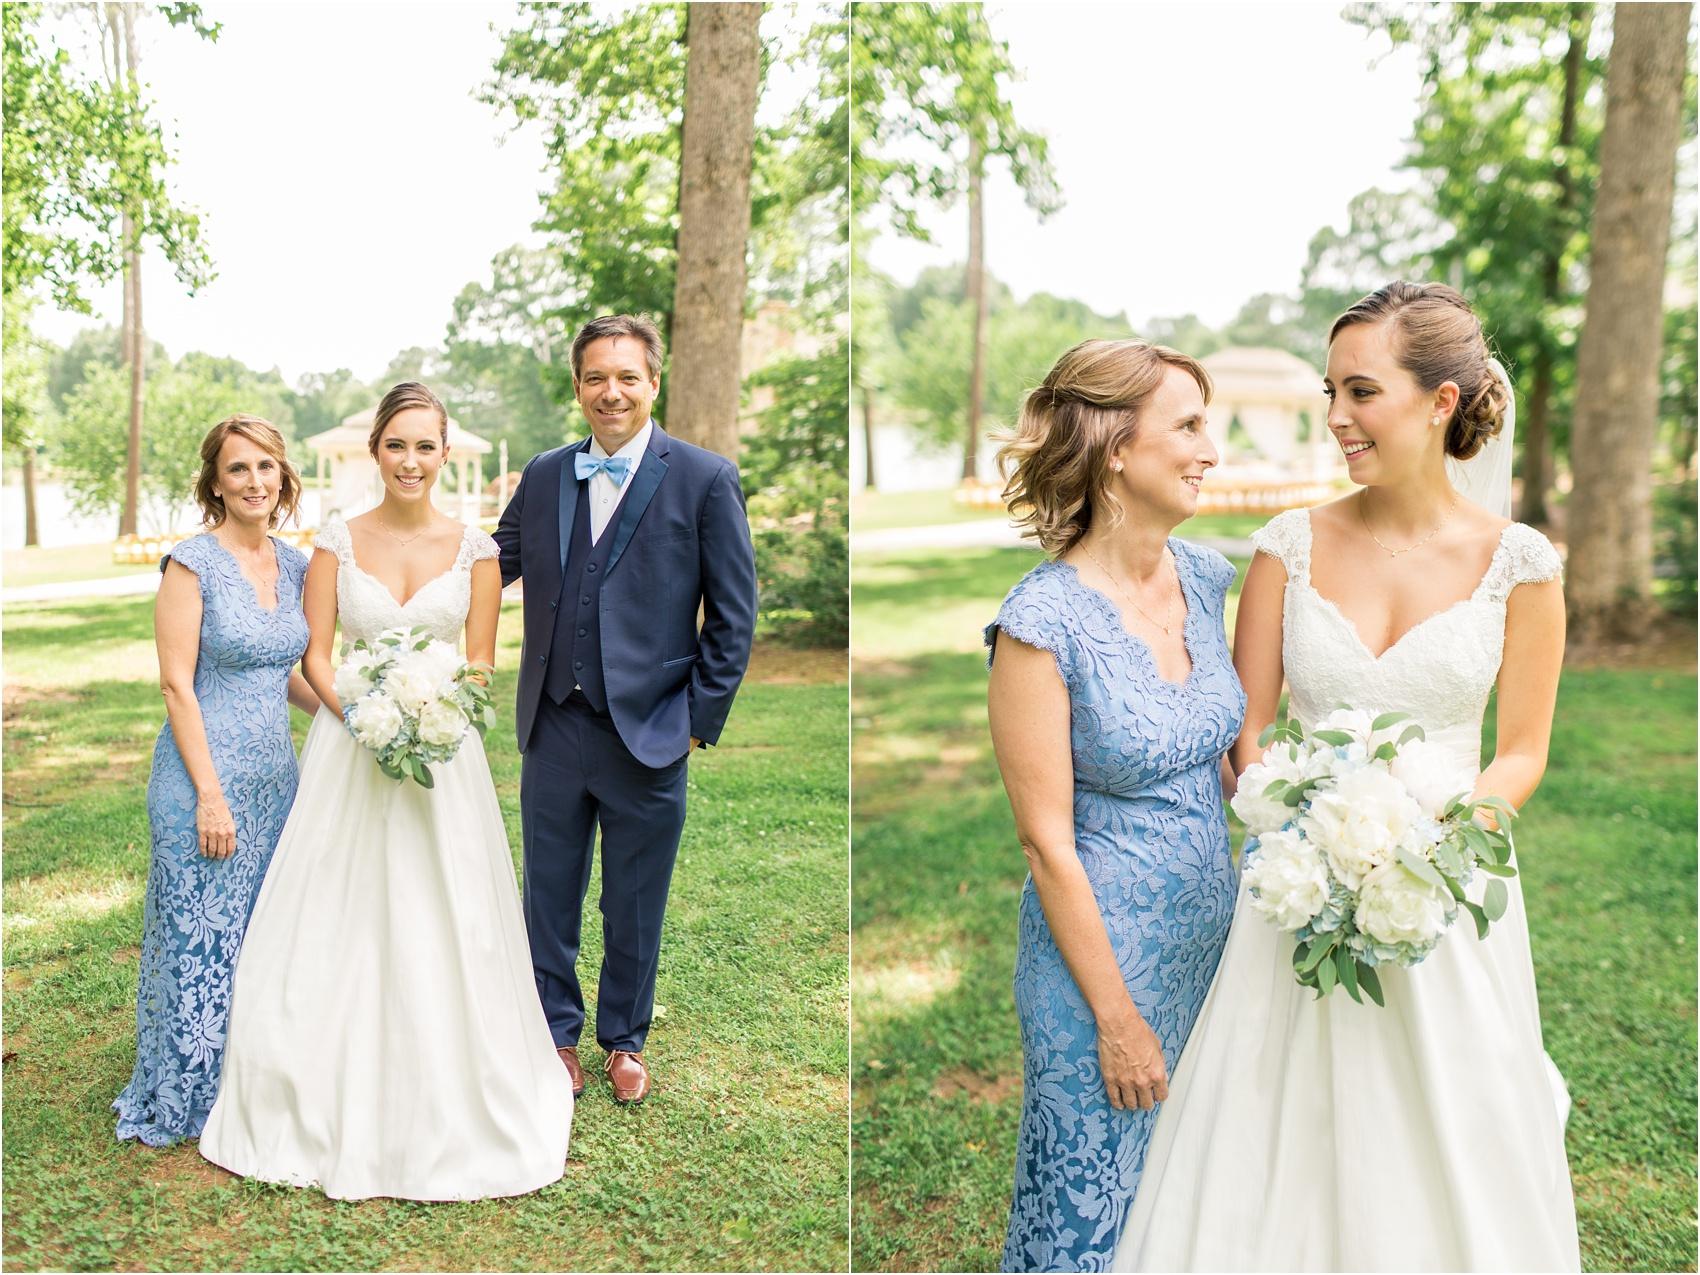 Savannah Eve Photography- Sigl-Adams Wedding- Sneak Peek-17.jpg